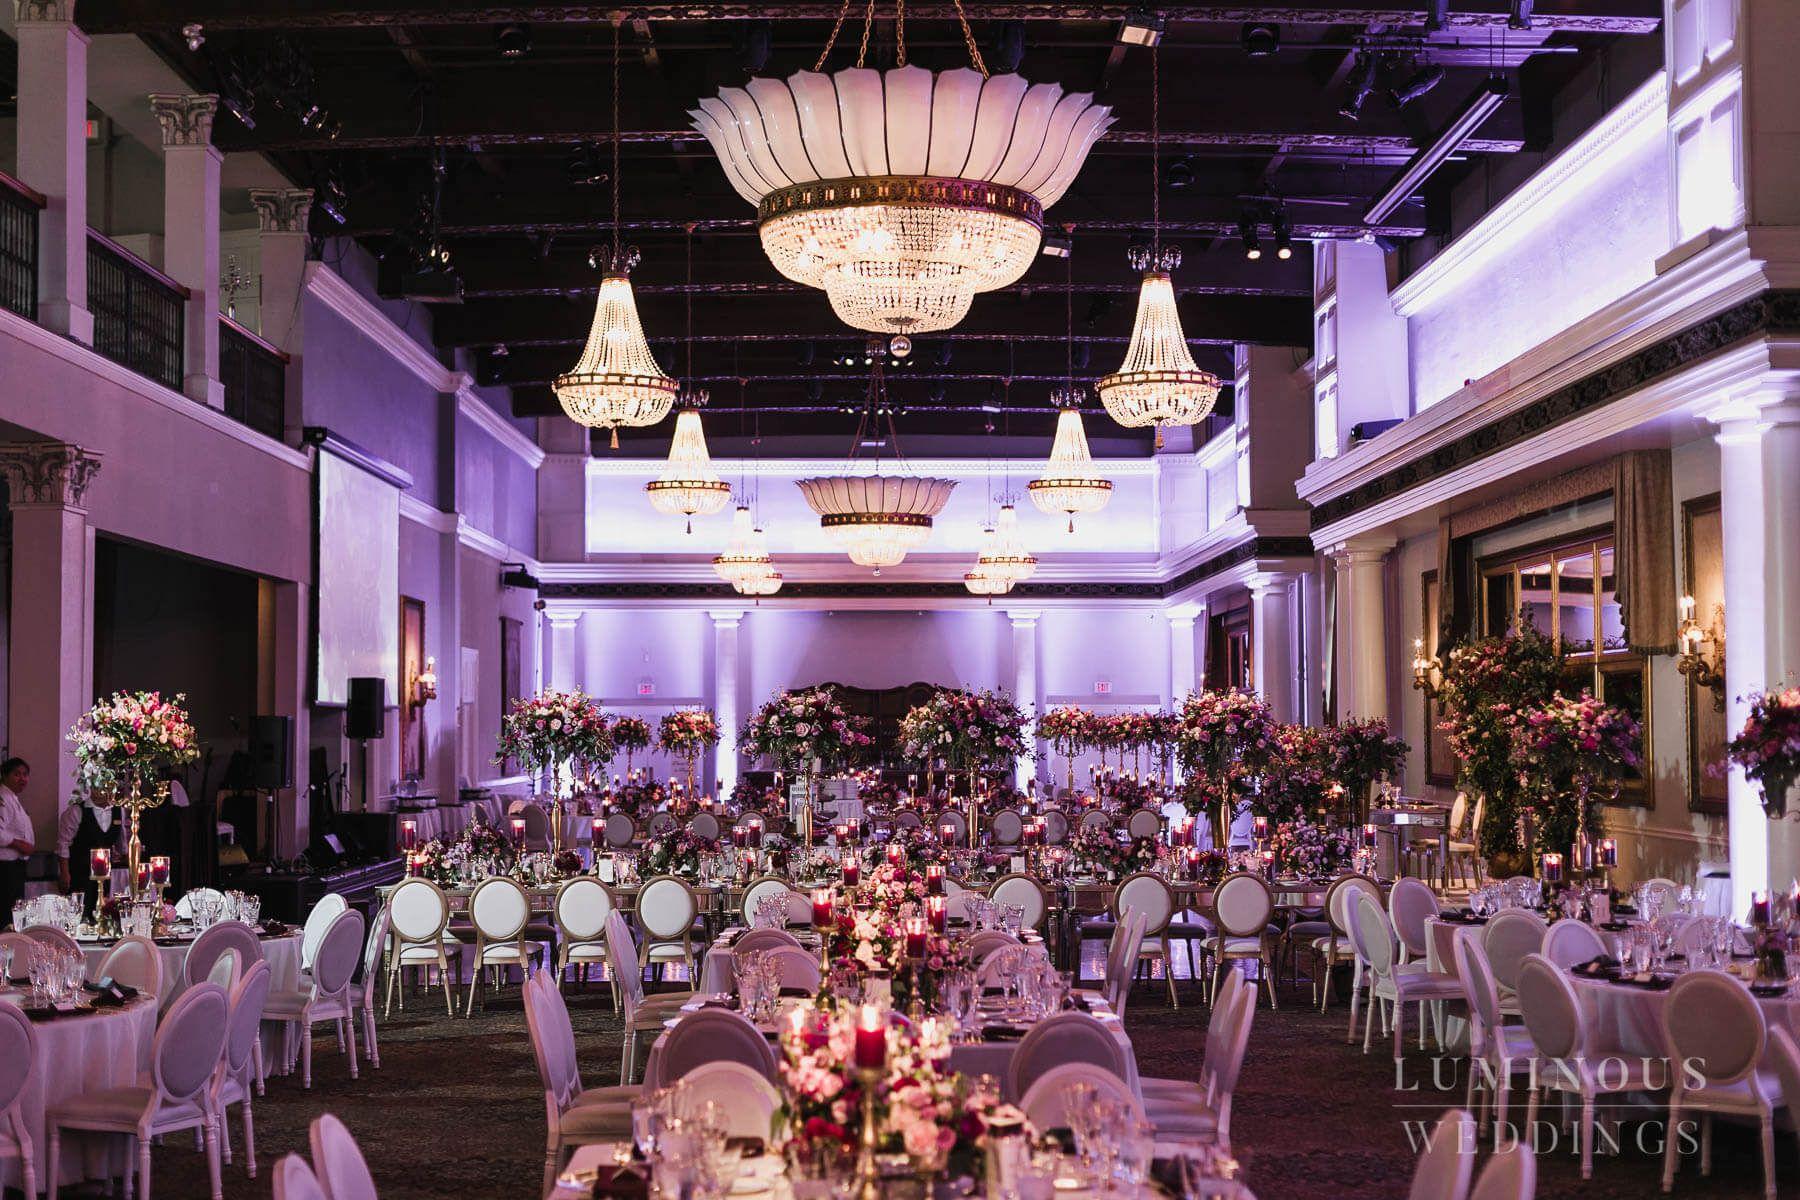 Stephanie And Elliot Liberty Grand Wedding Venue And Decor